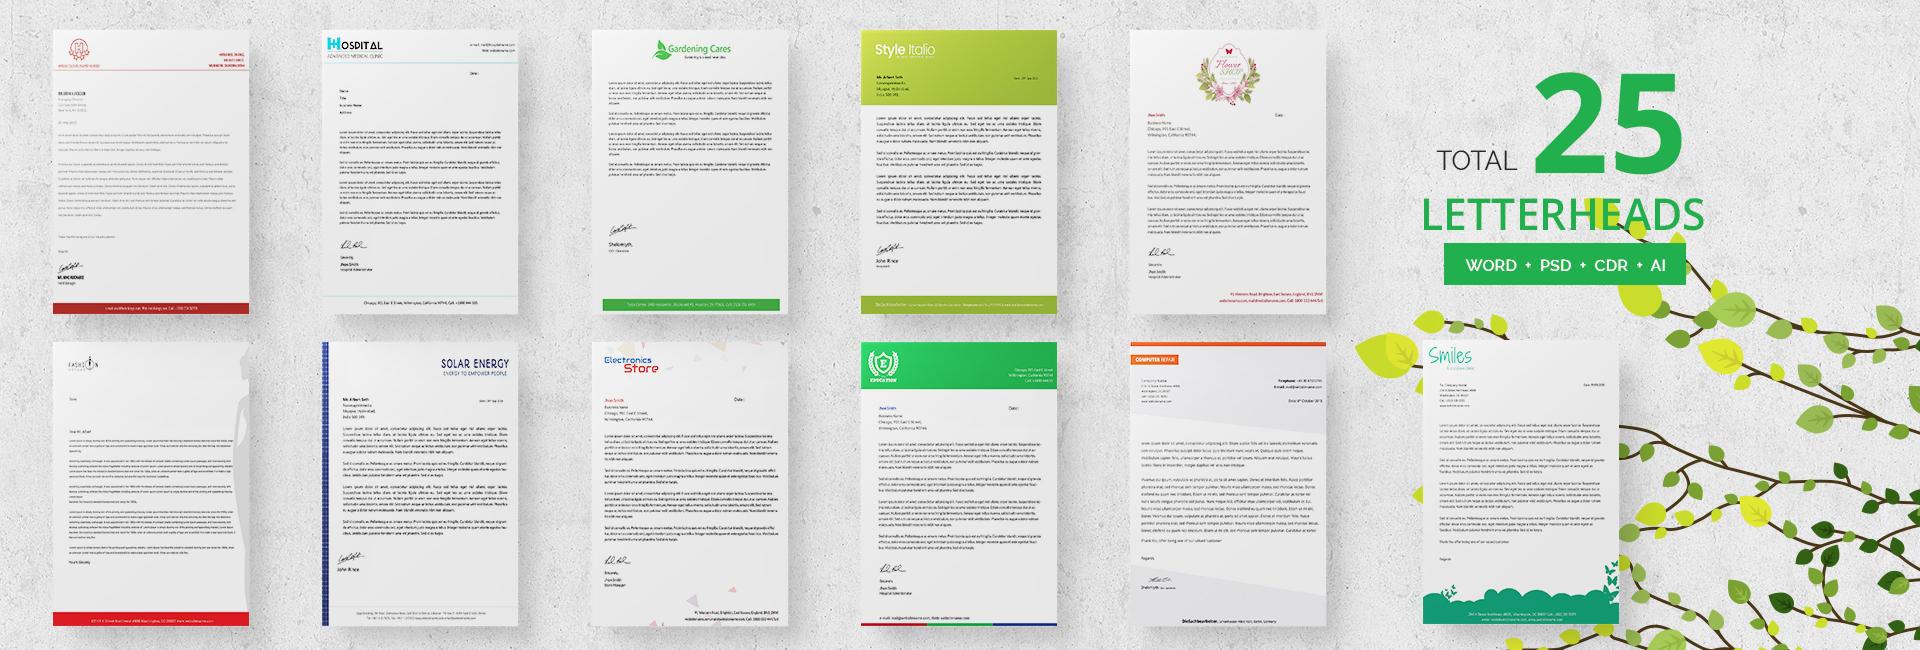 letterheadtemplates